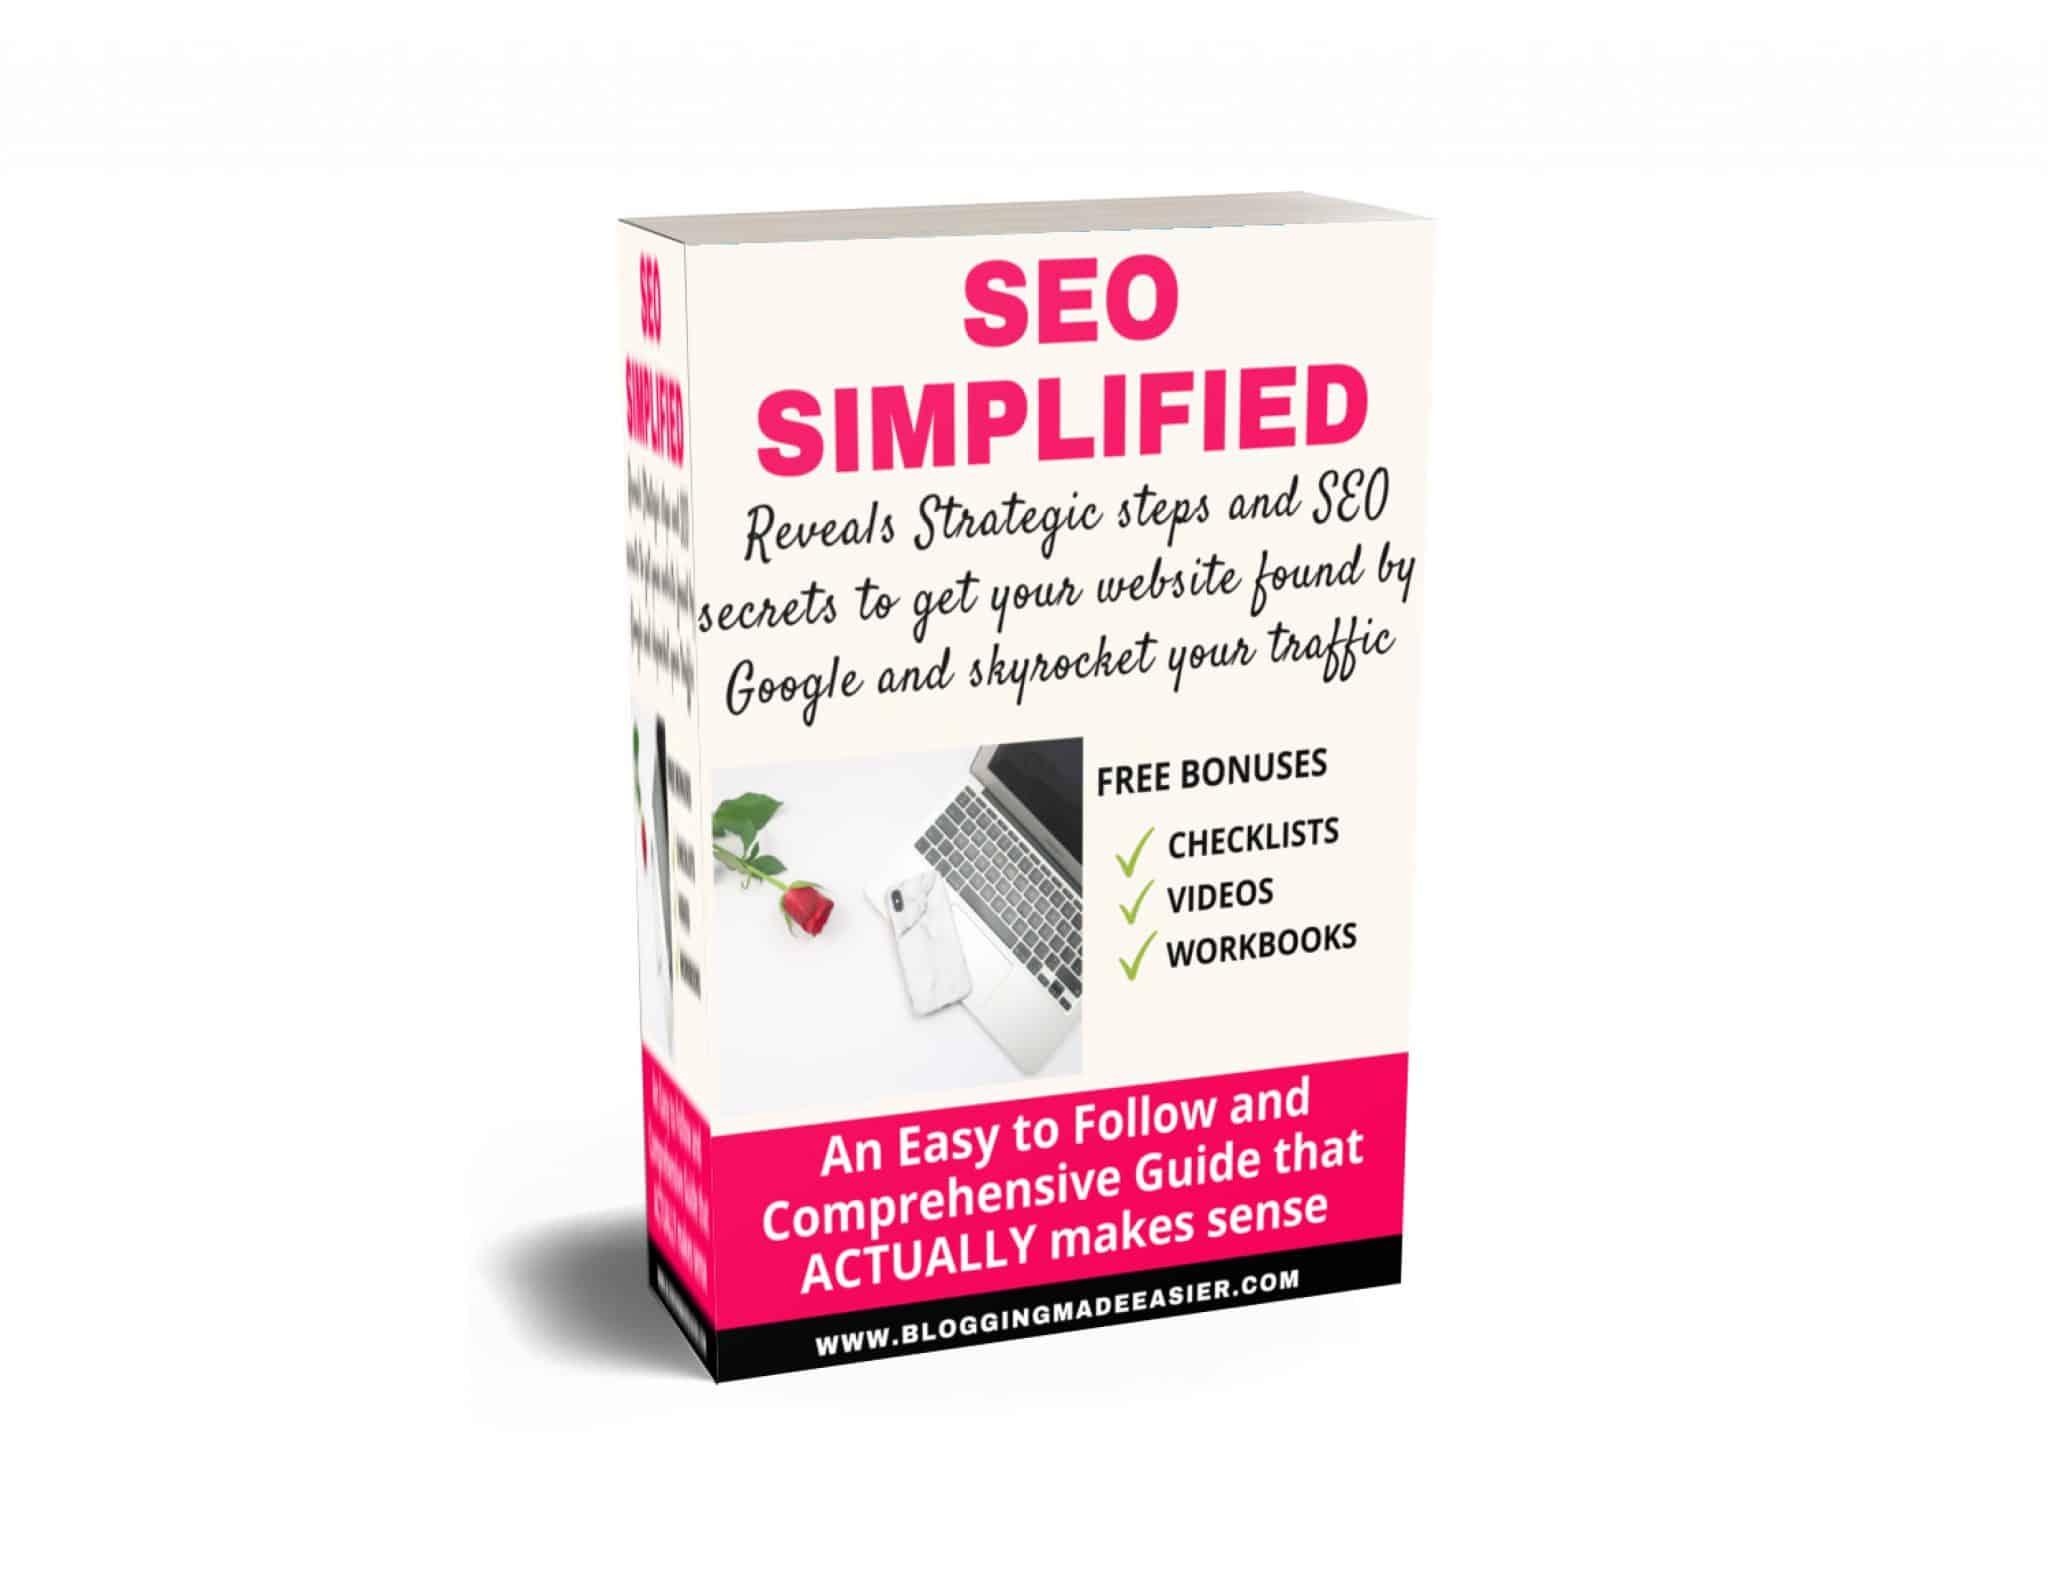 SEO simplified ebook 3d cover